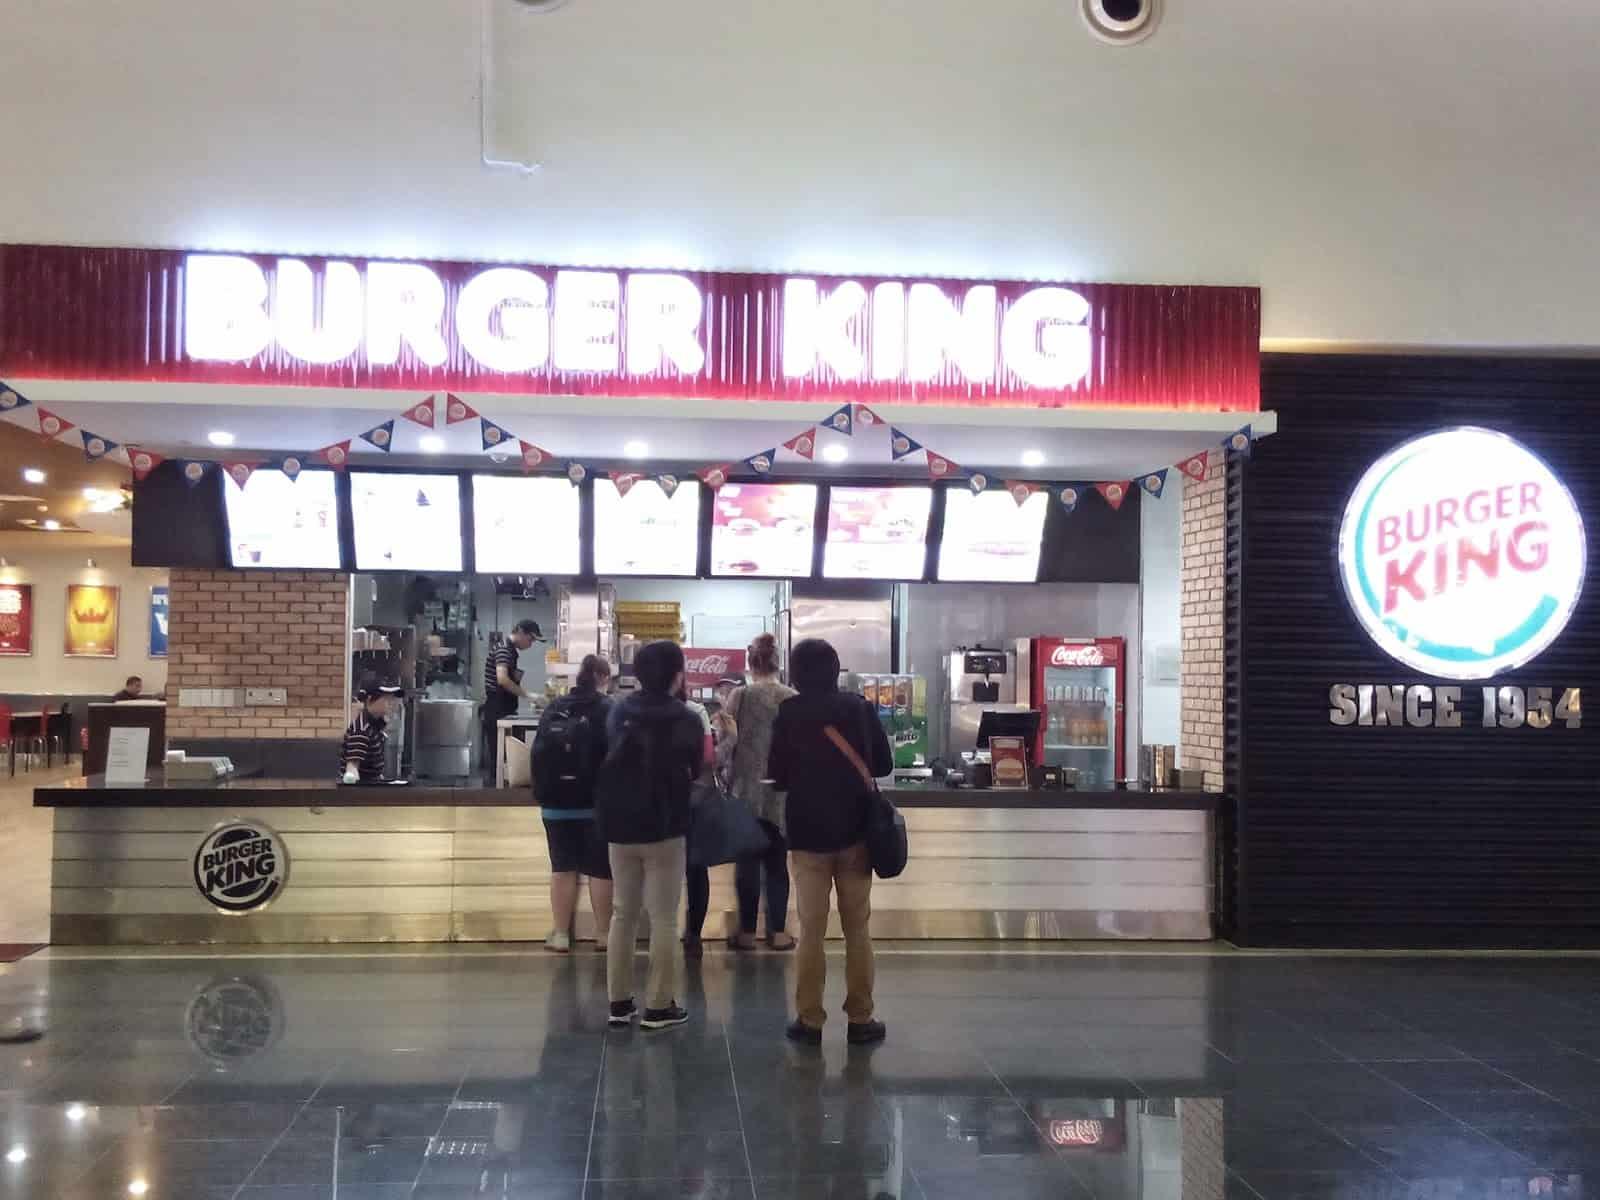 Burger King at Noi Bai airport - Hanoi airport food